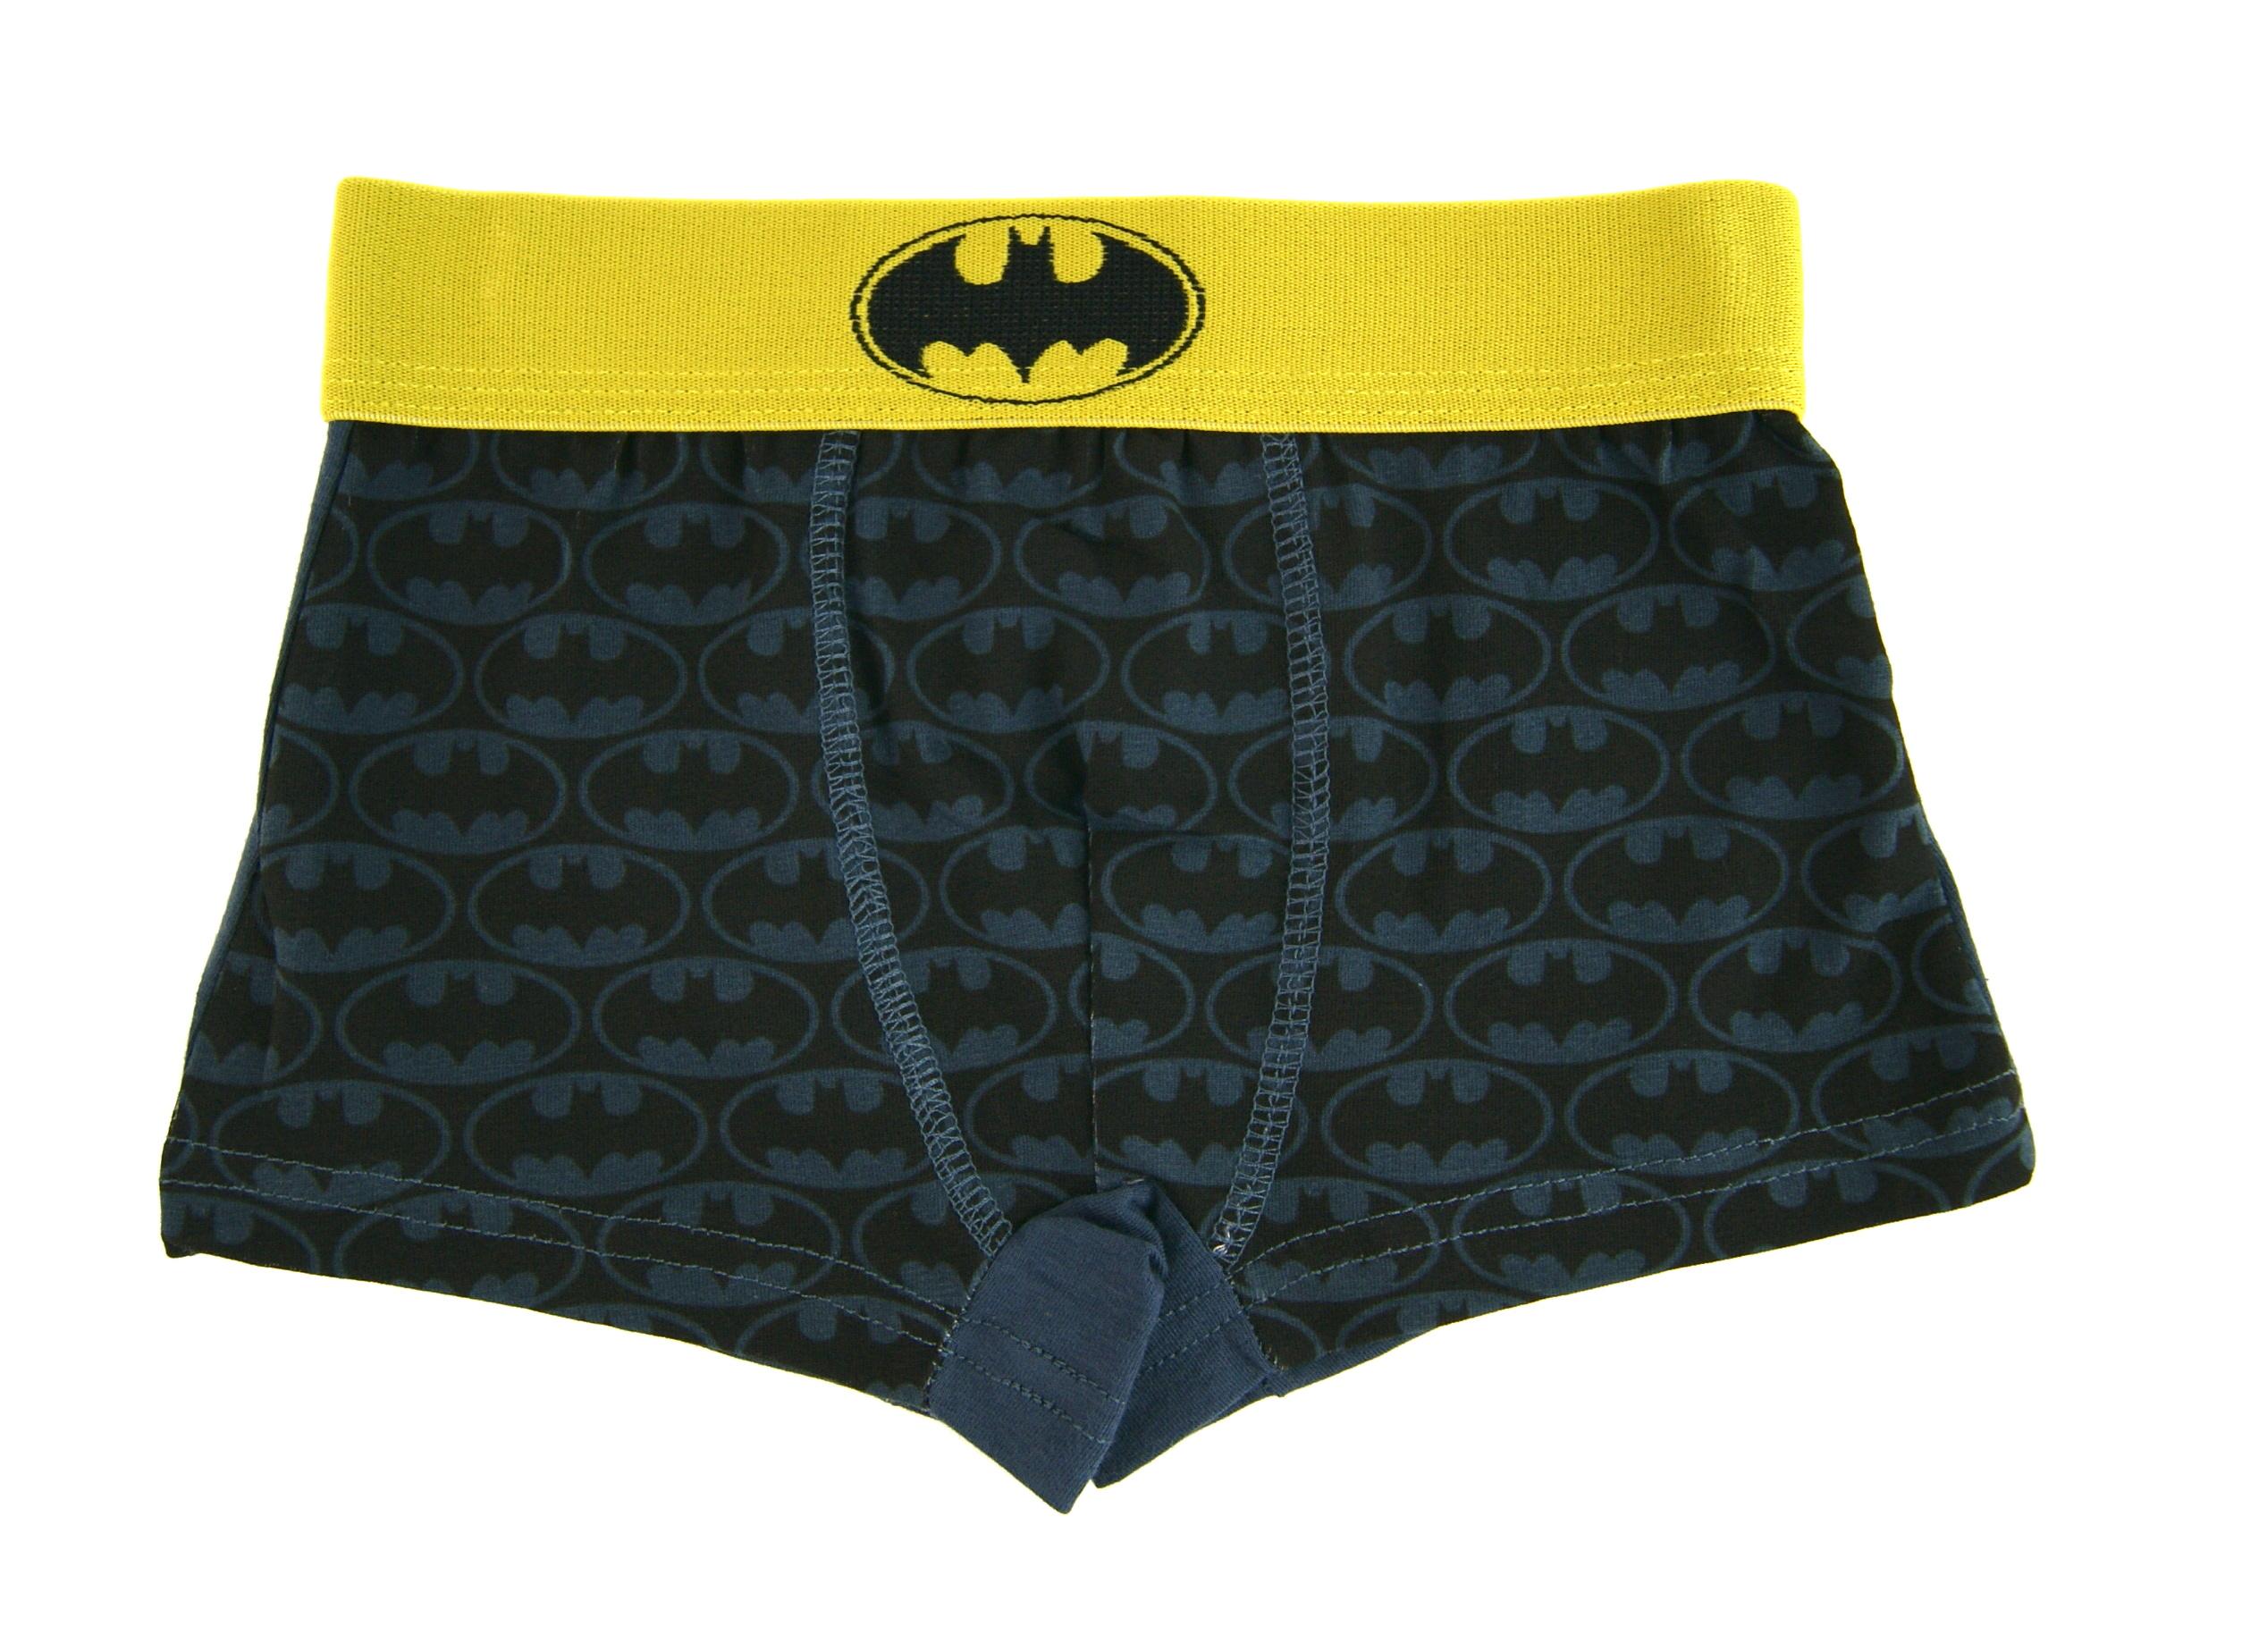 DC Comics Batman Ragazzi 2 Pack Boxer Ragazzi Biancheria Intima Slip Boxer Taglia